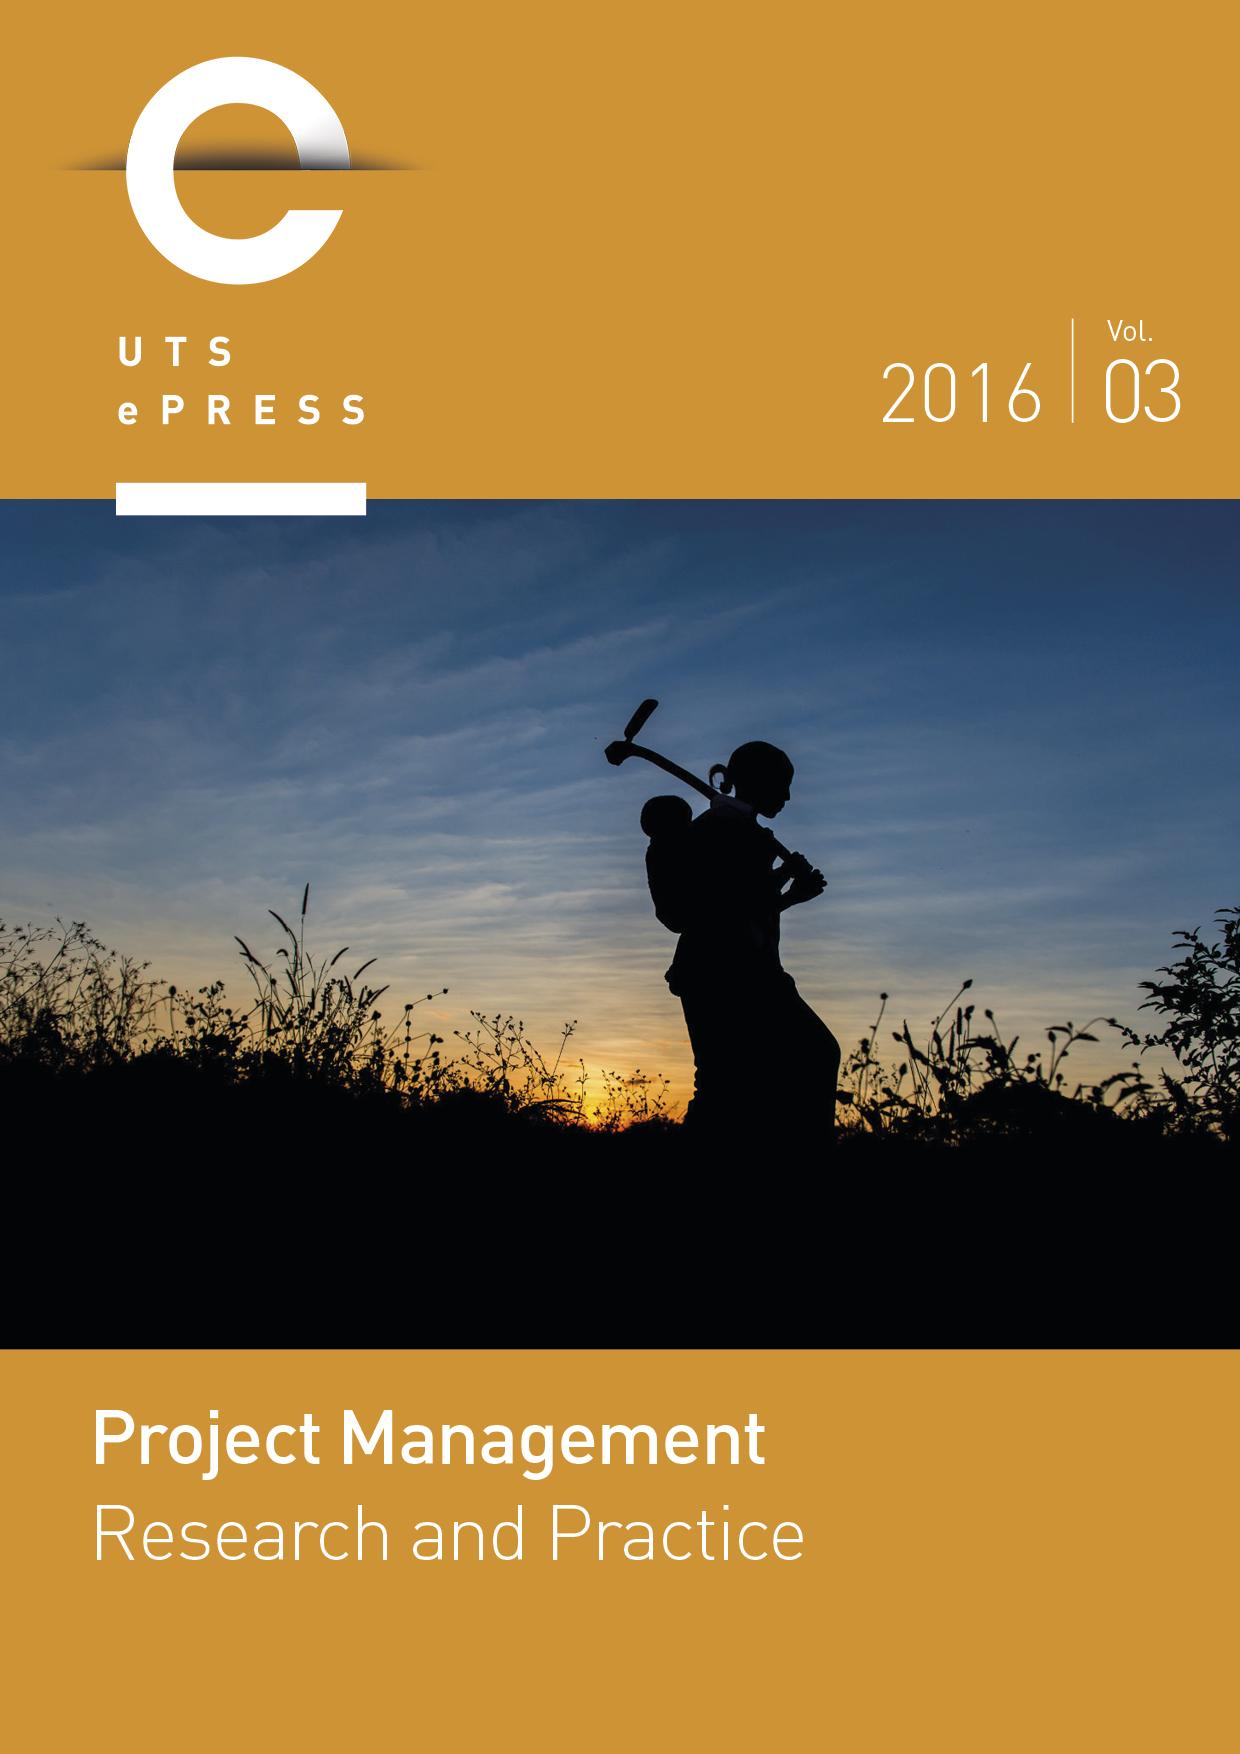 PMRP Cover Vol 3 (2016)